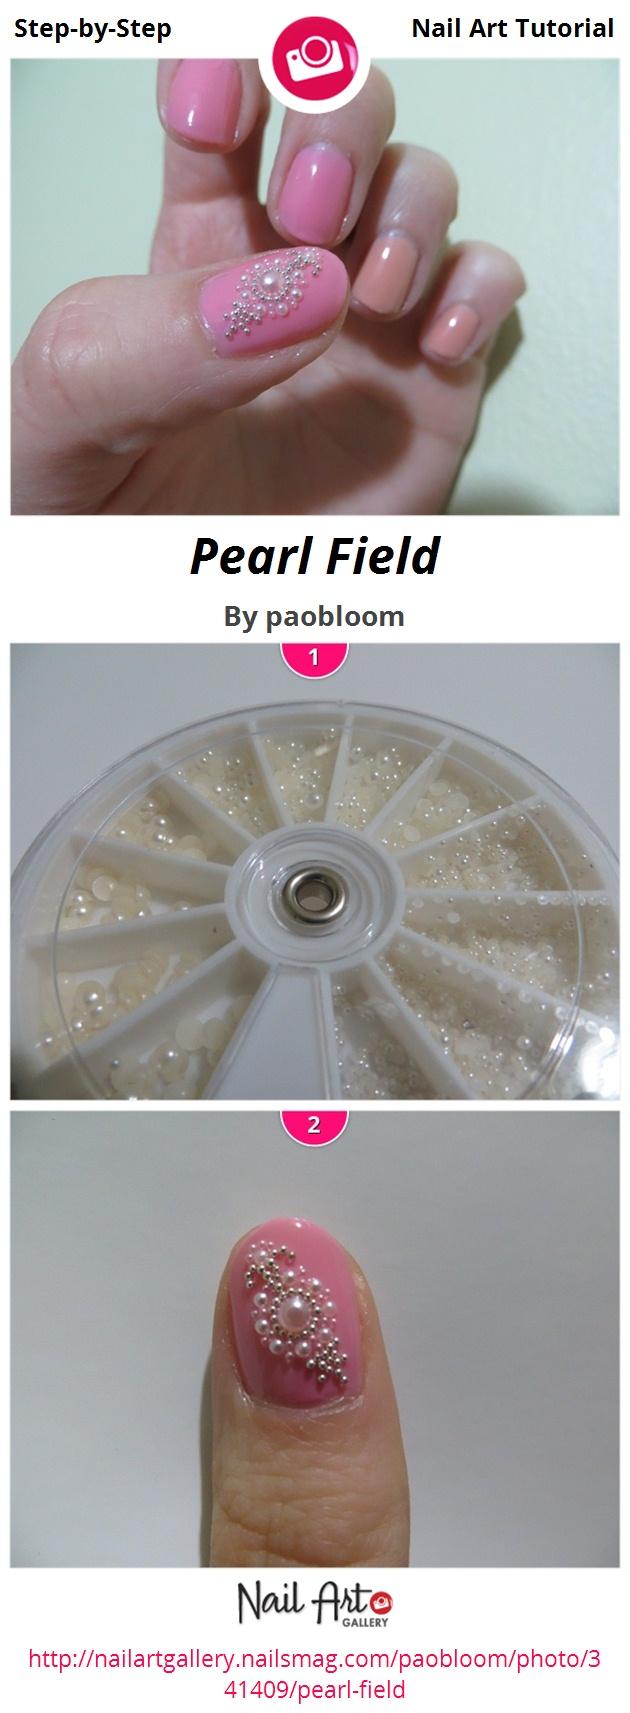 Pearl Field - Nail Art Gallery